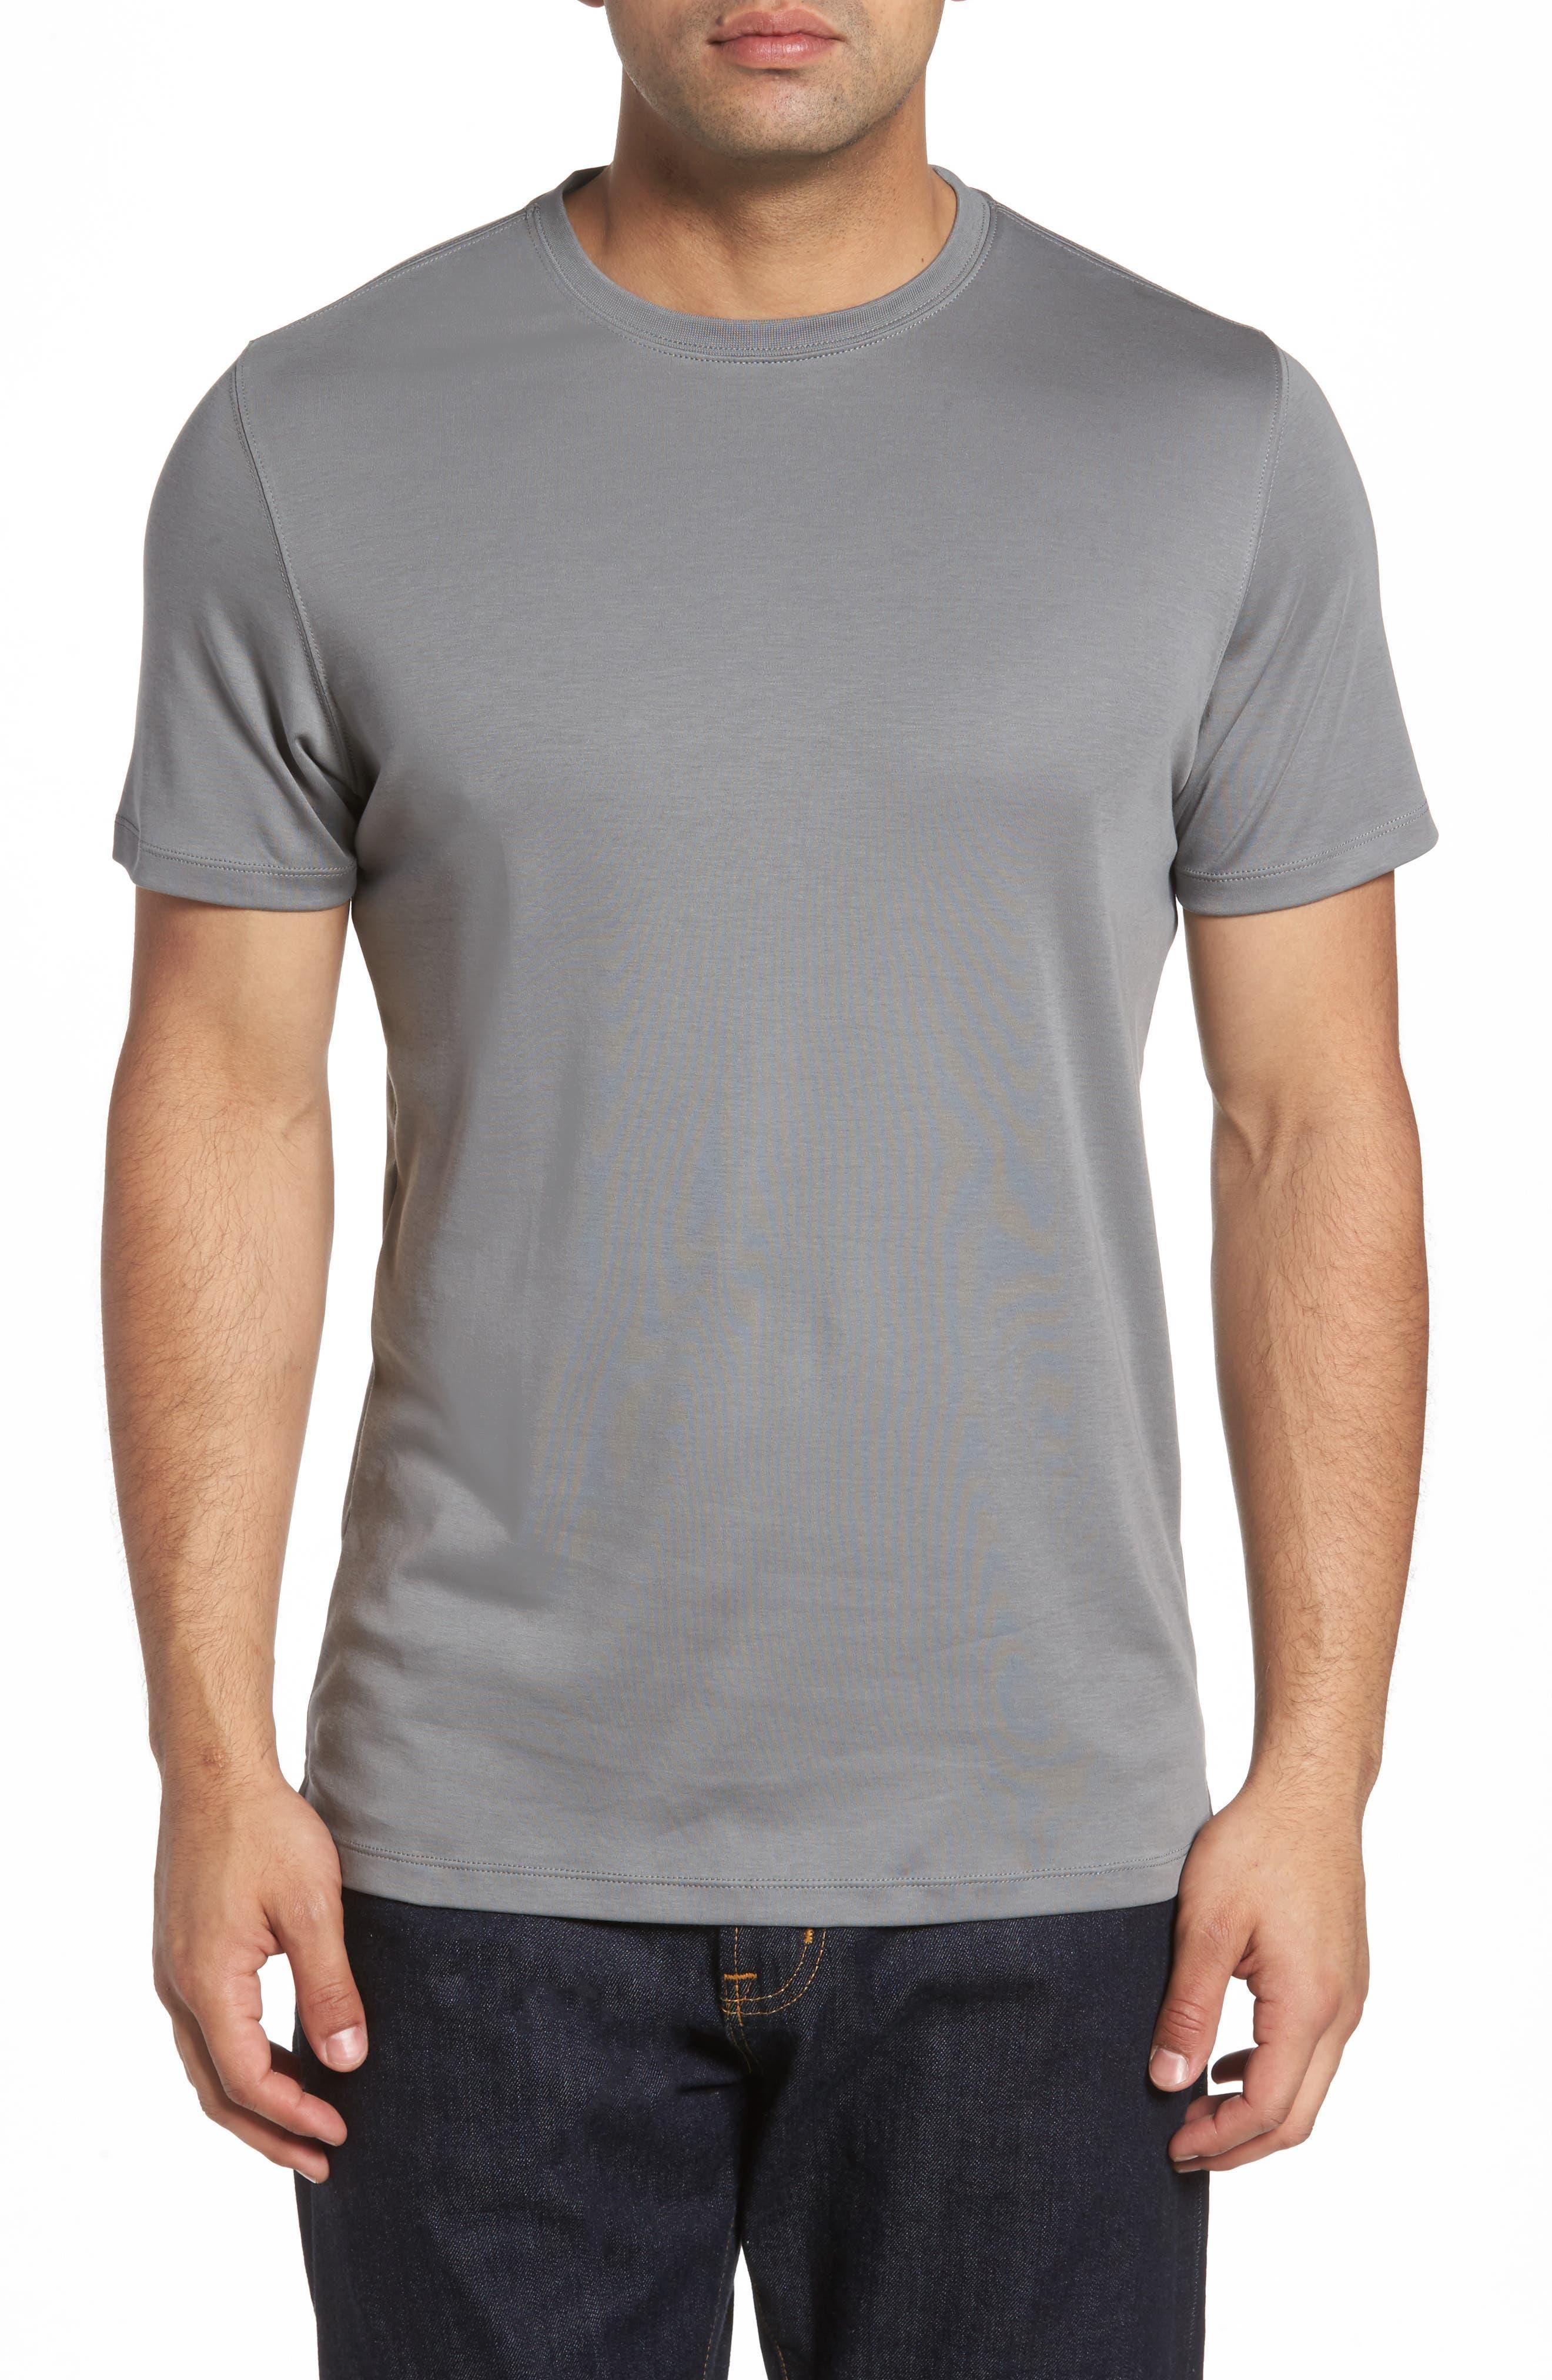 Main Image - Robert Barakett 'Georgia' Crewneck T-Shirt